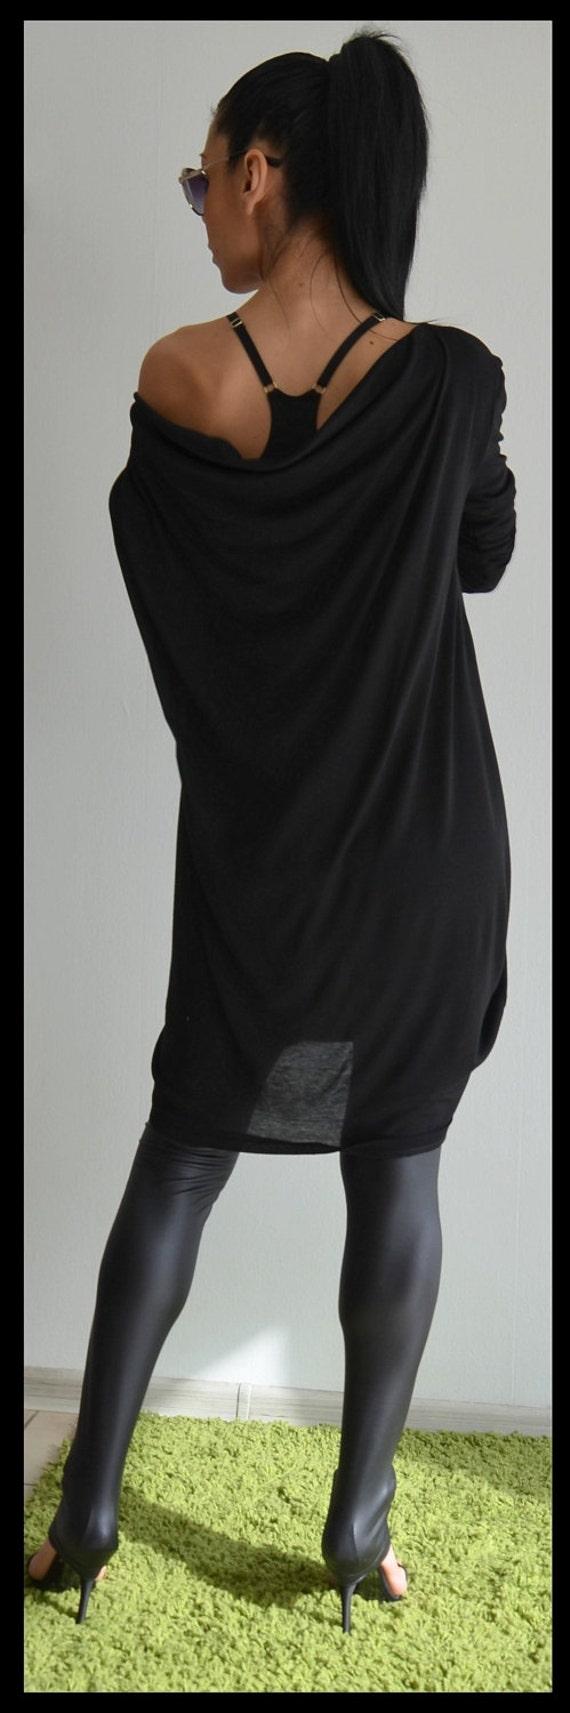 Plus Dress Blouse Party Tunic Plus Shirt Shirt Clothing Maternity Size Size Summer Shirt Tunic T Top Tunic 5pczqx7T